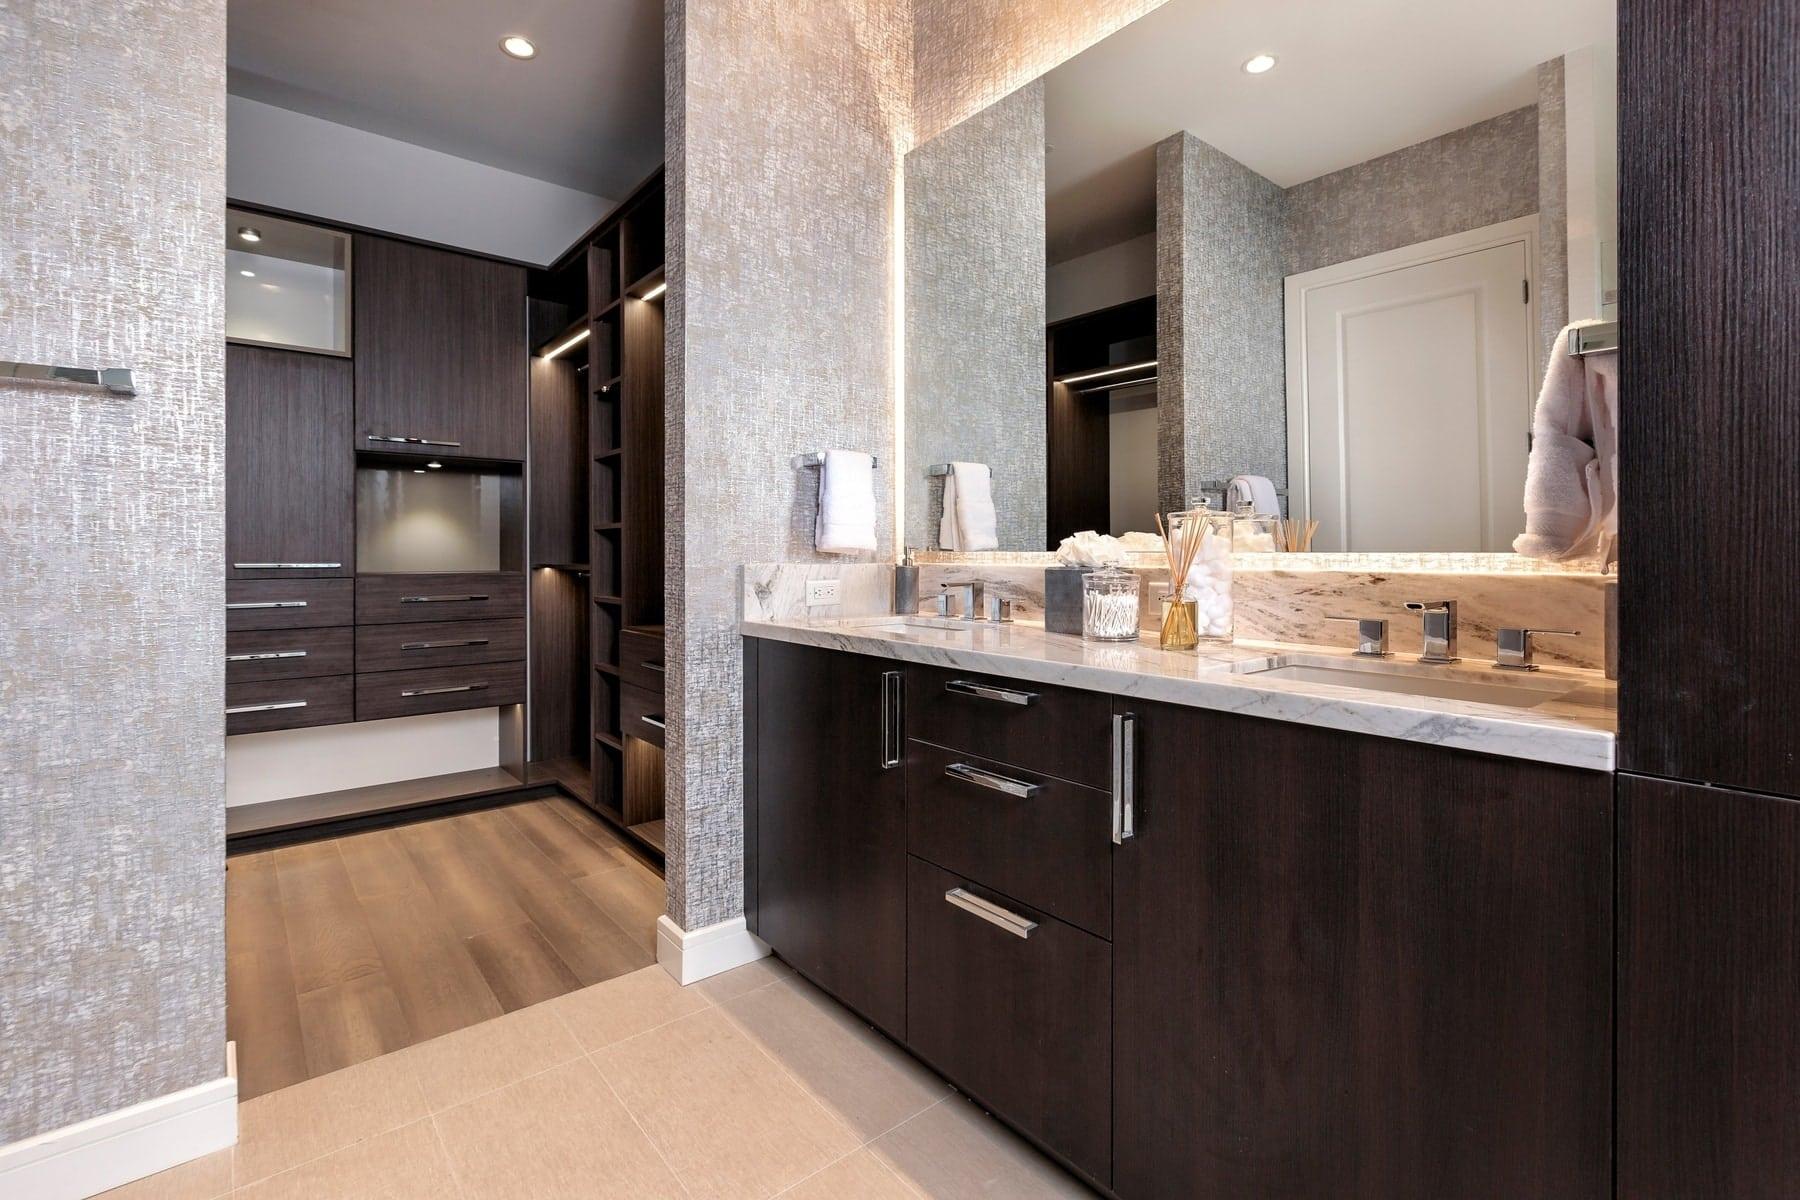 master bathroom and custom walk-in closet in the model unit of arabella luxury condos in houston